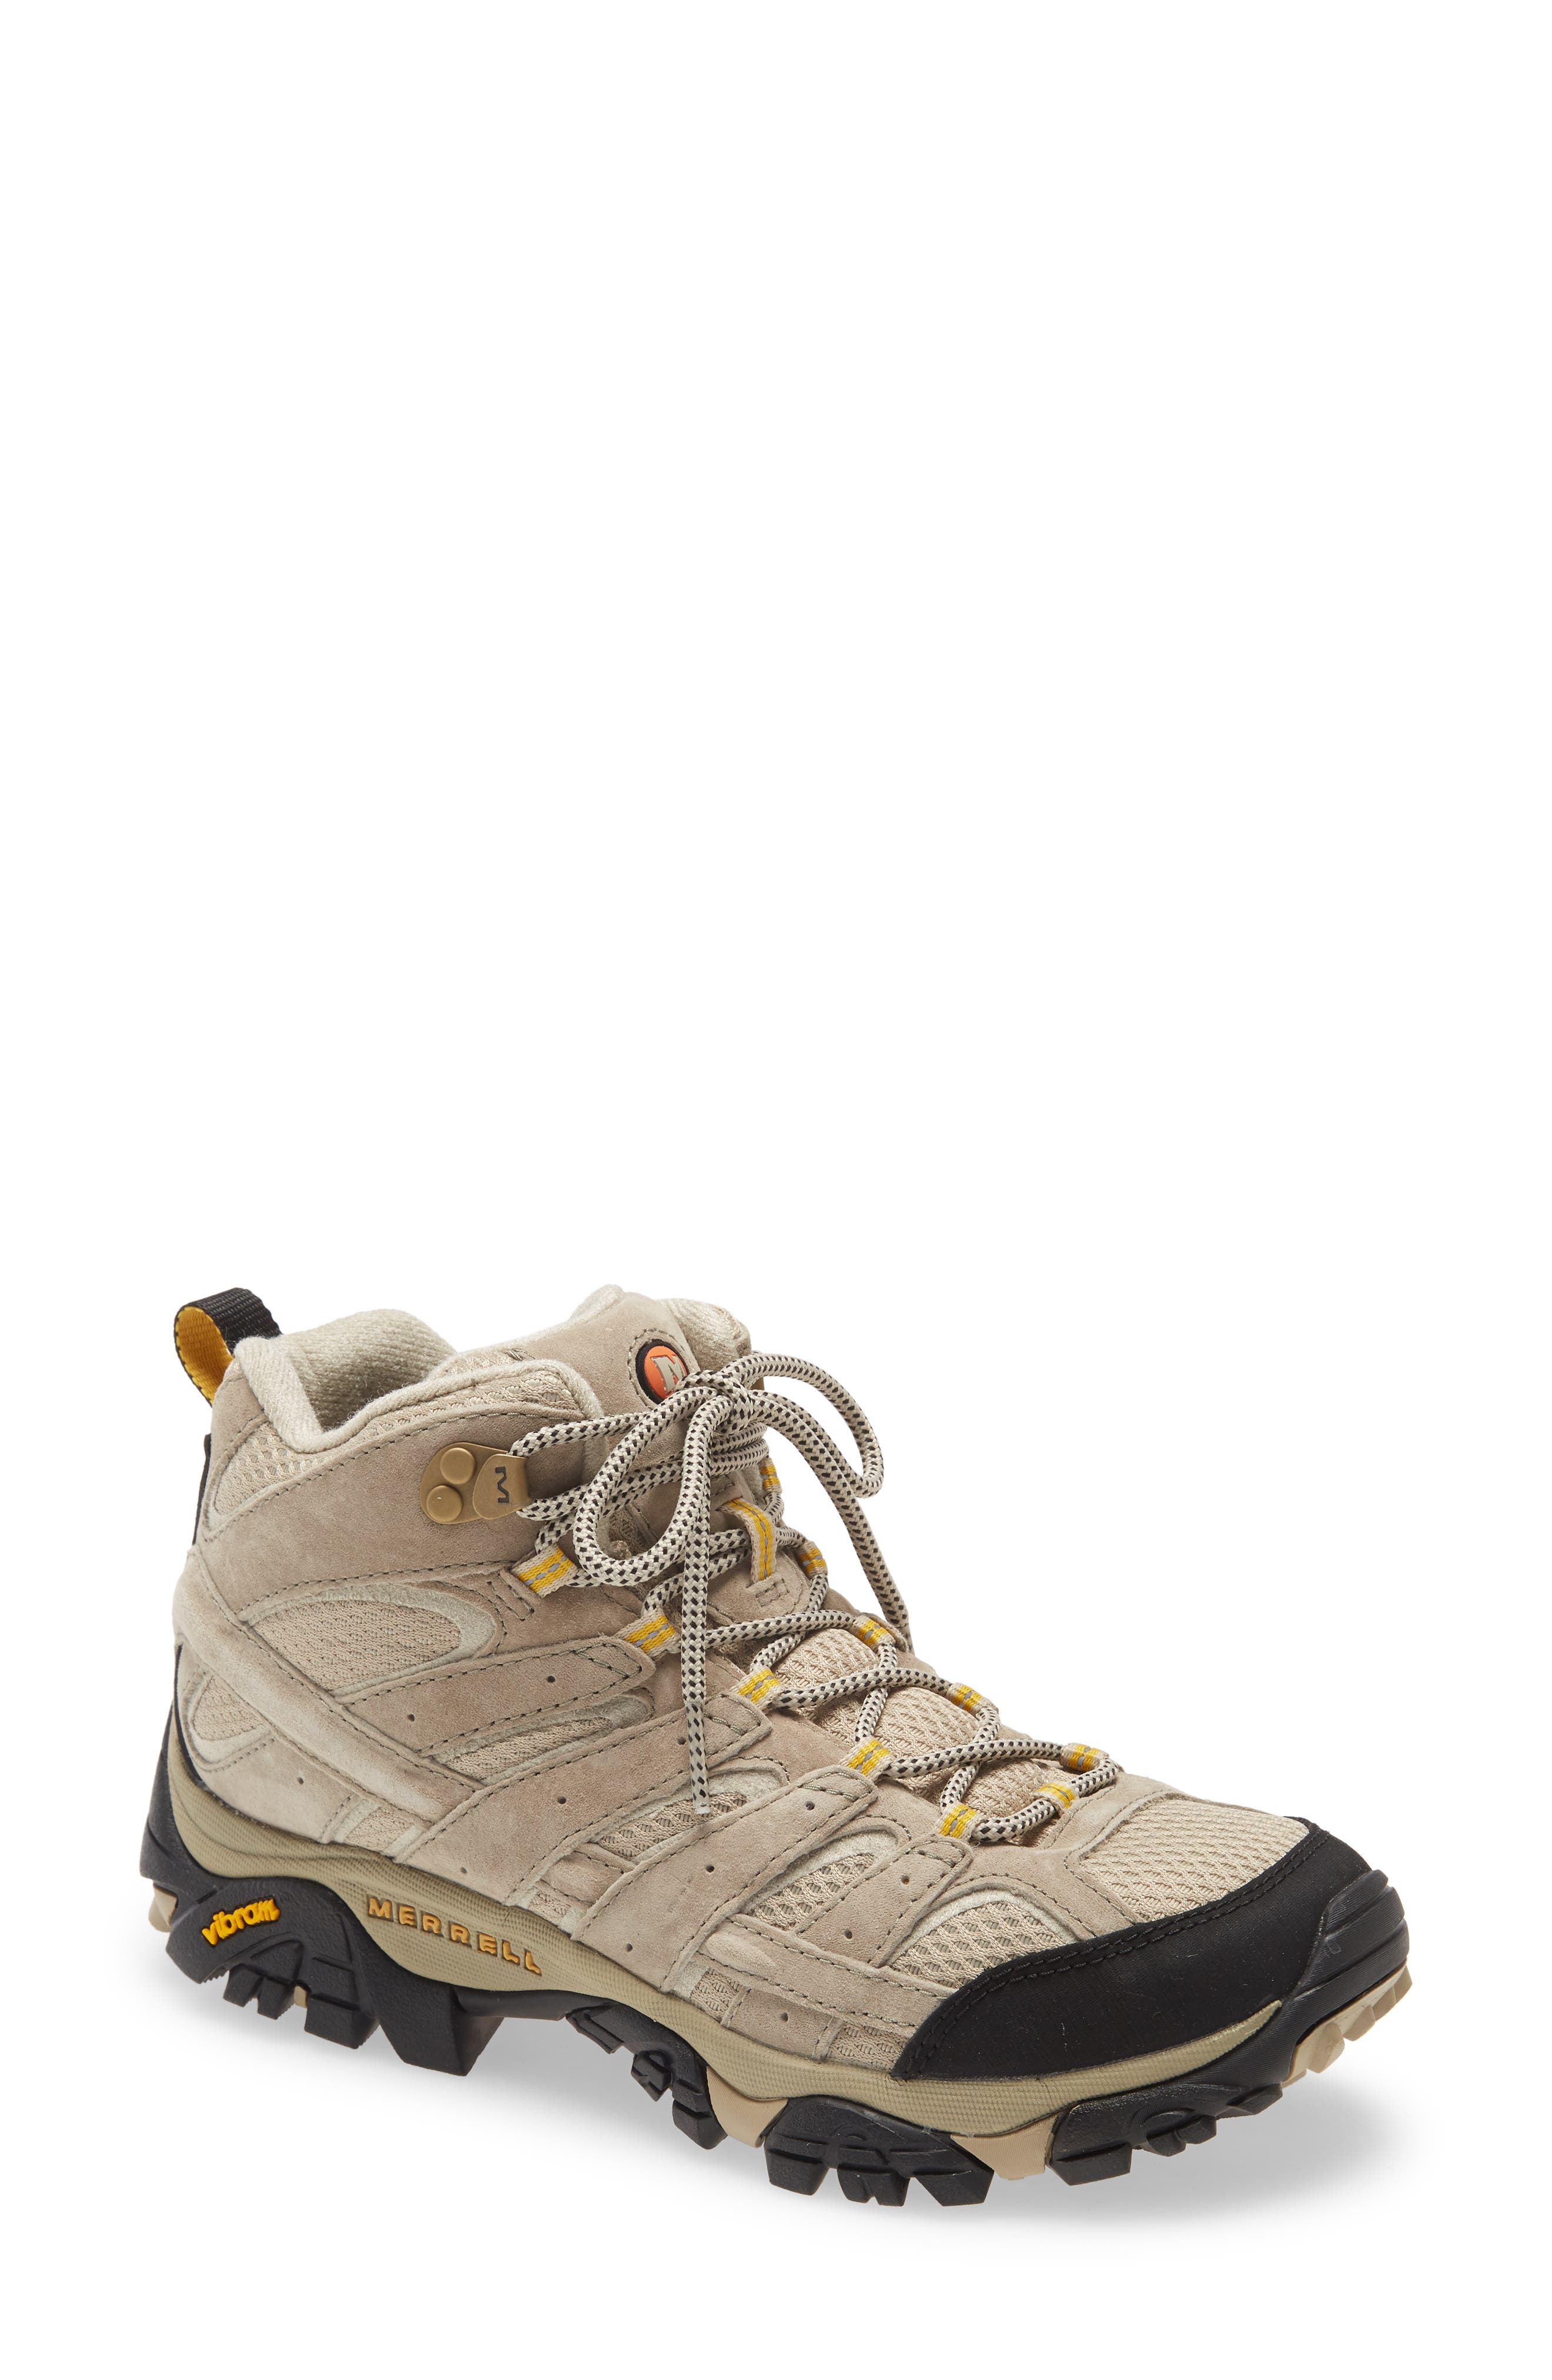 Moab 2 Mid Ventilator Shoe